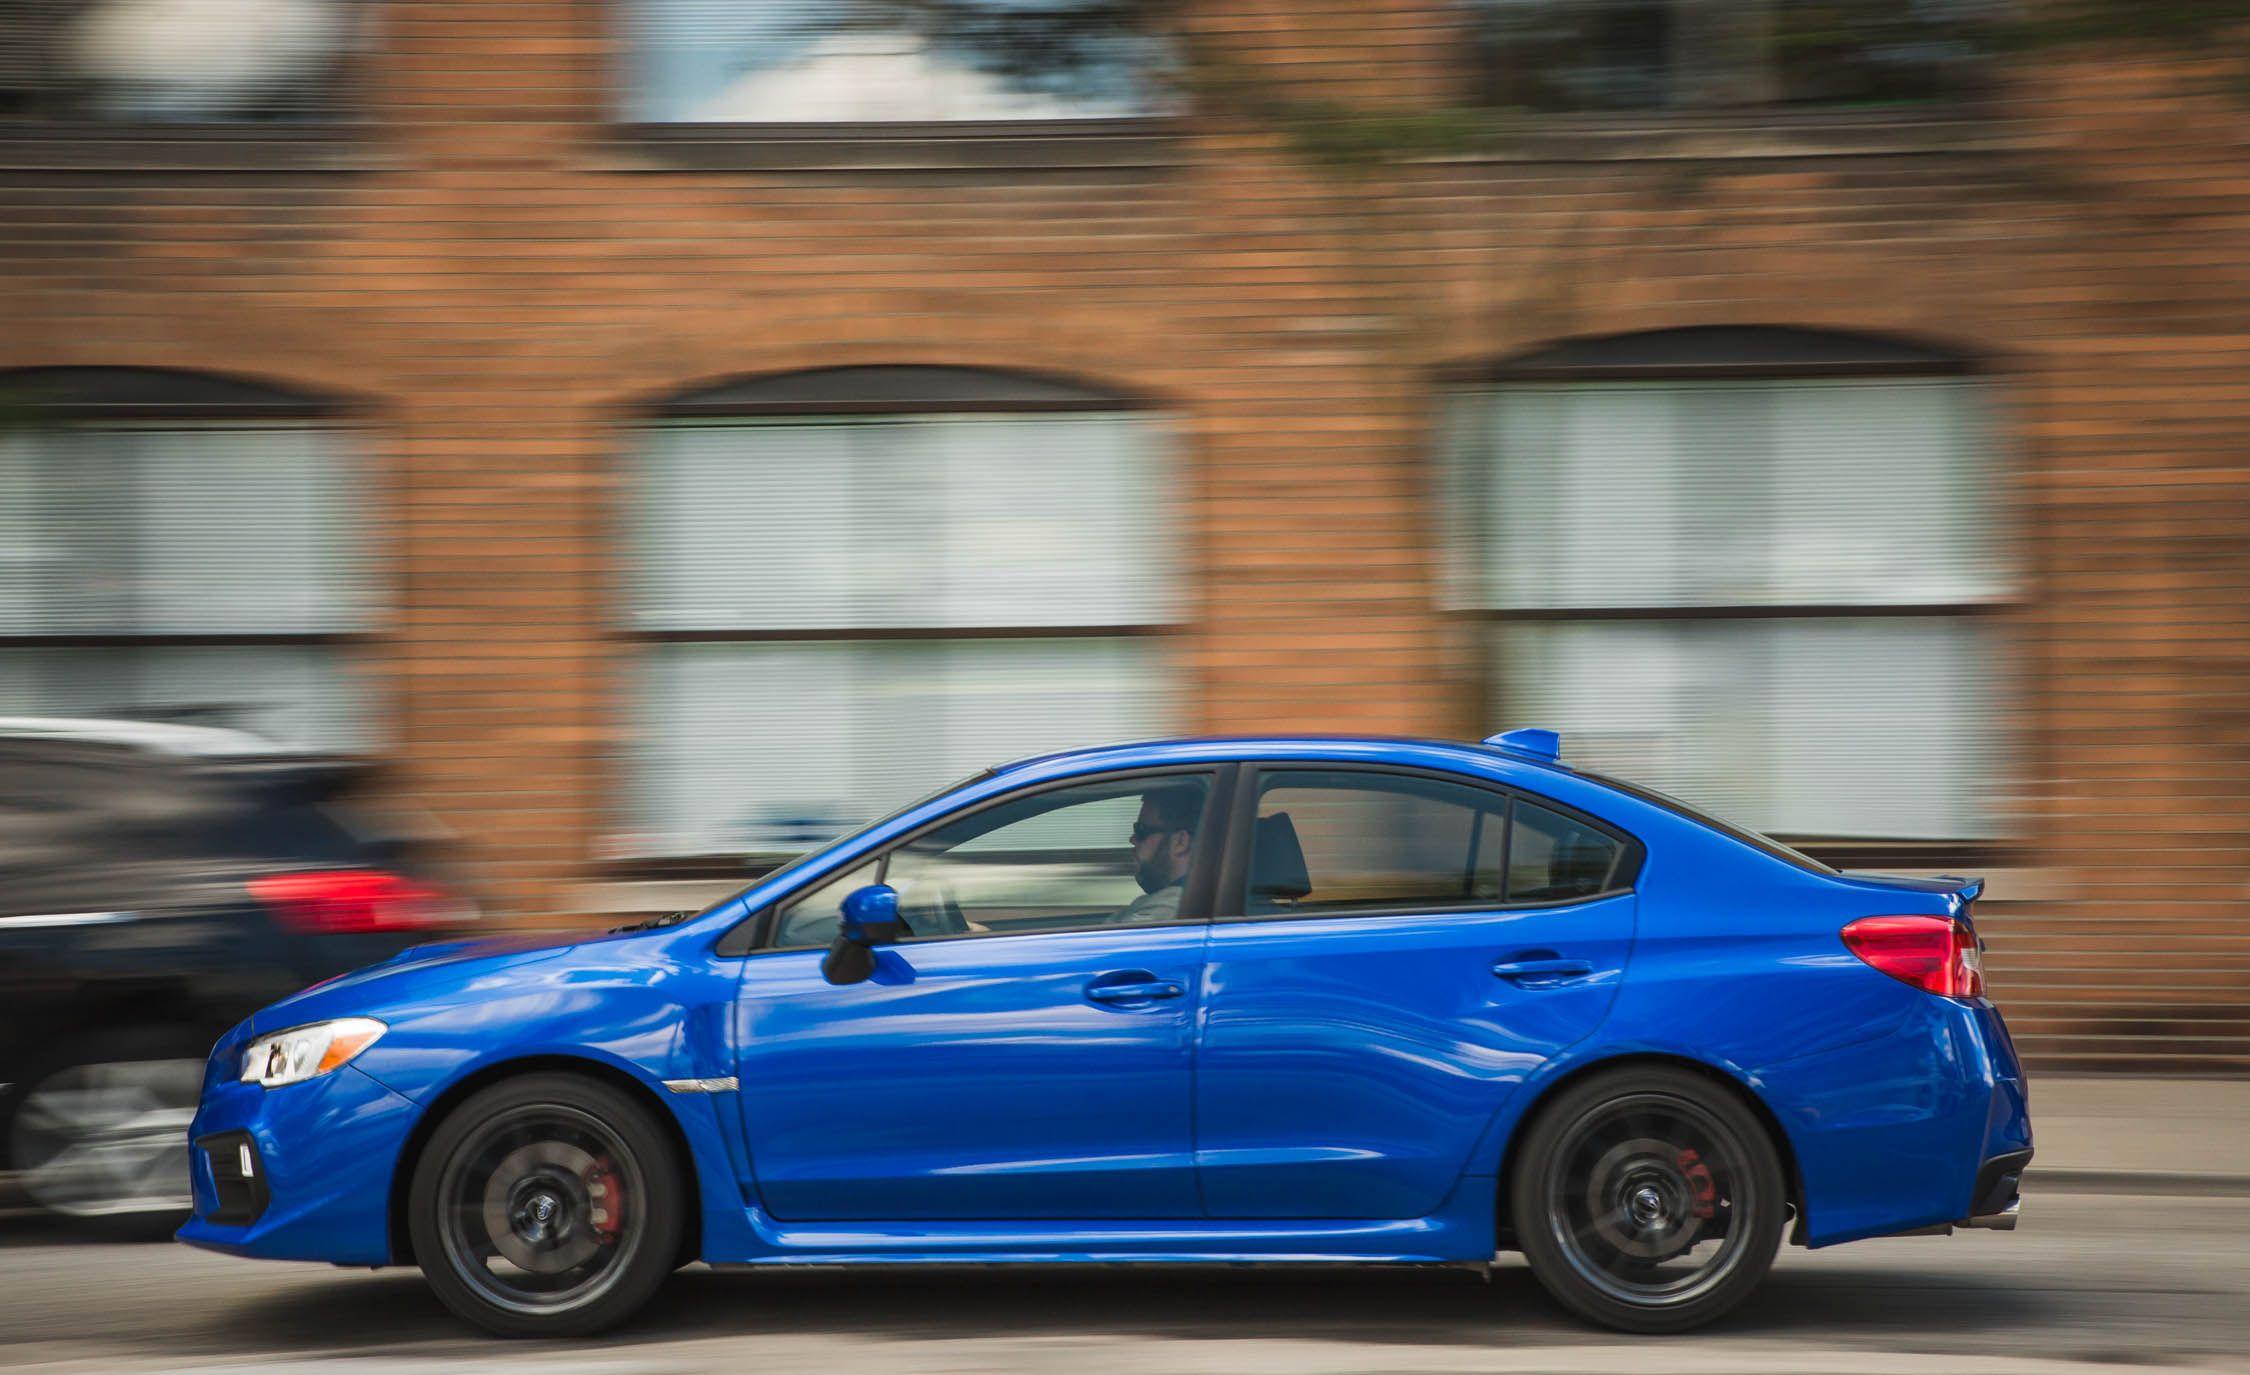 2016 Ford Focus RS vs Subaru WRX STI VW Golf R